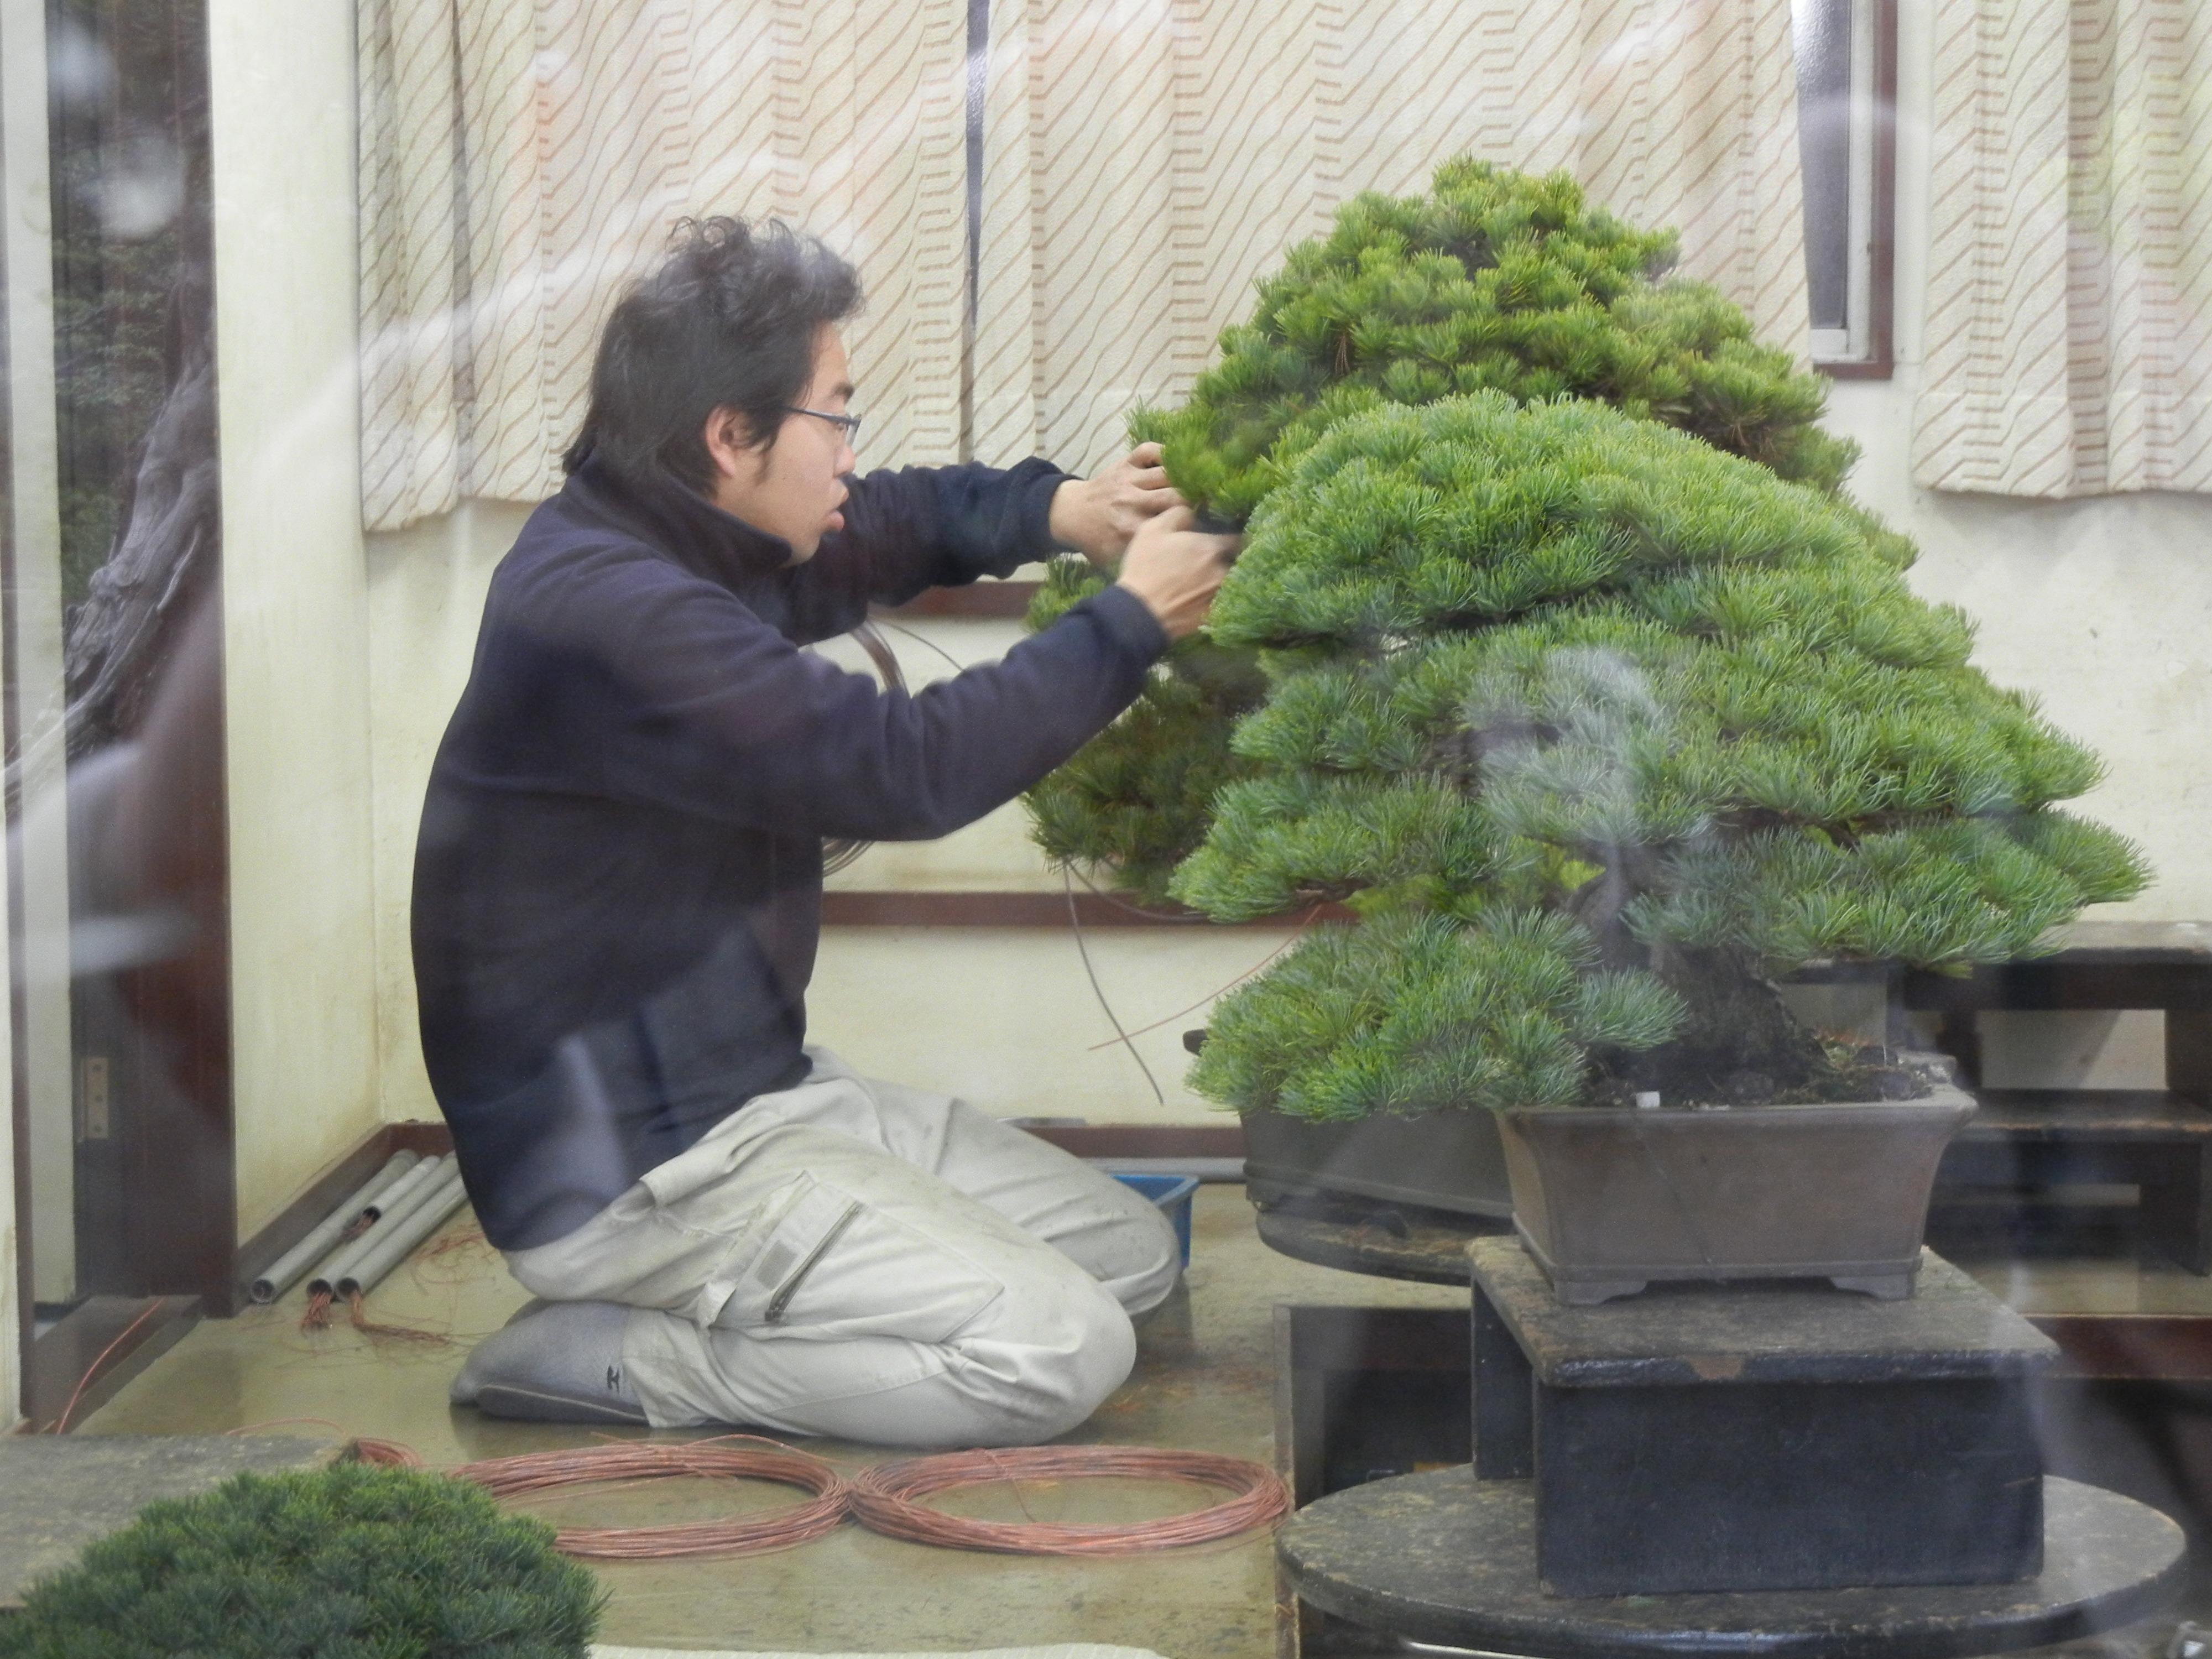 Terrific Wiring Put It On And Leave It A On Bit The Art Of Bonsai Wiring Cloud Staixaidewilluminateatxorg